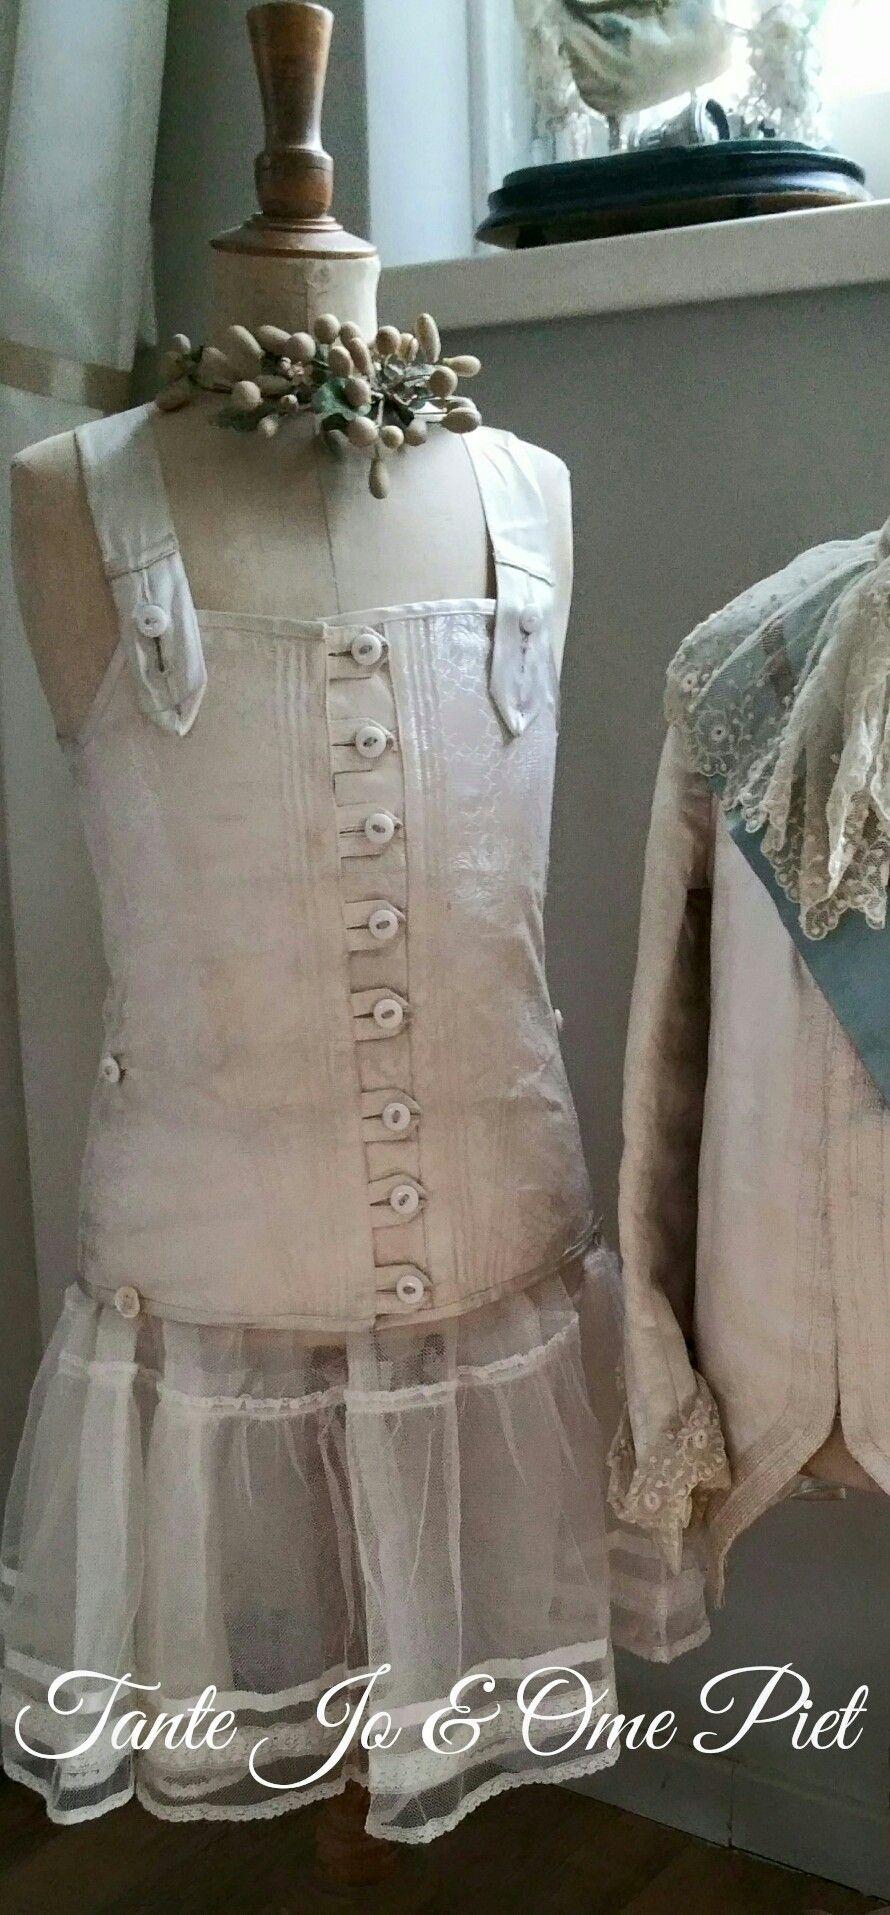 Girly vintage zimmer dekor pin by dina khaichenko on mannequins  pinterest  shabby chic